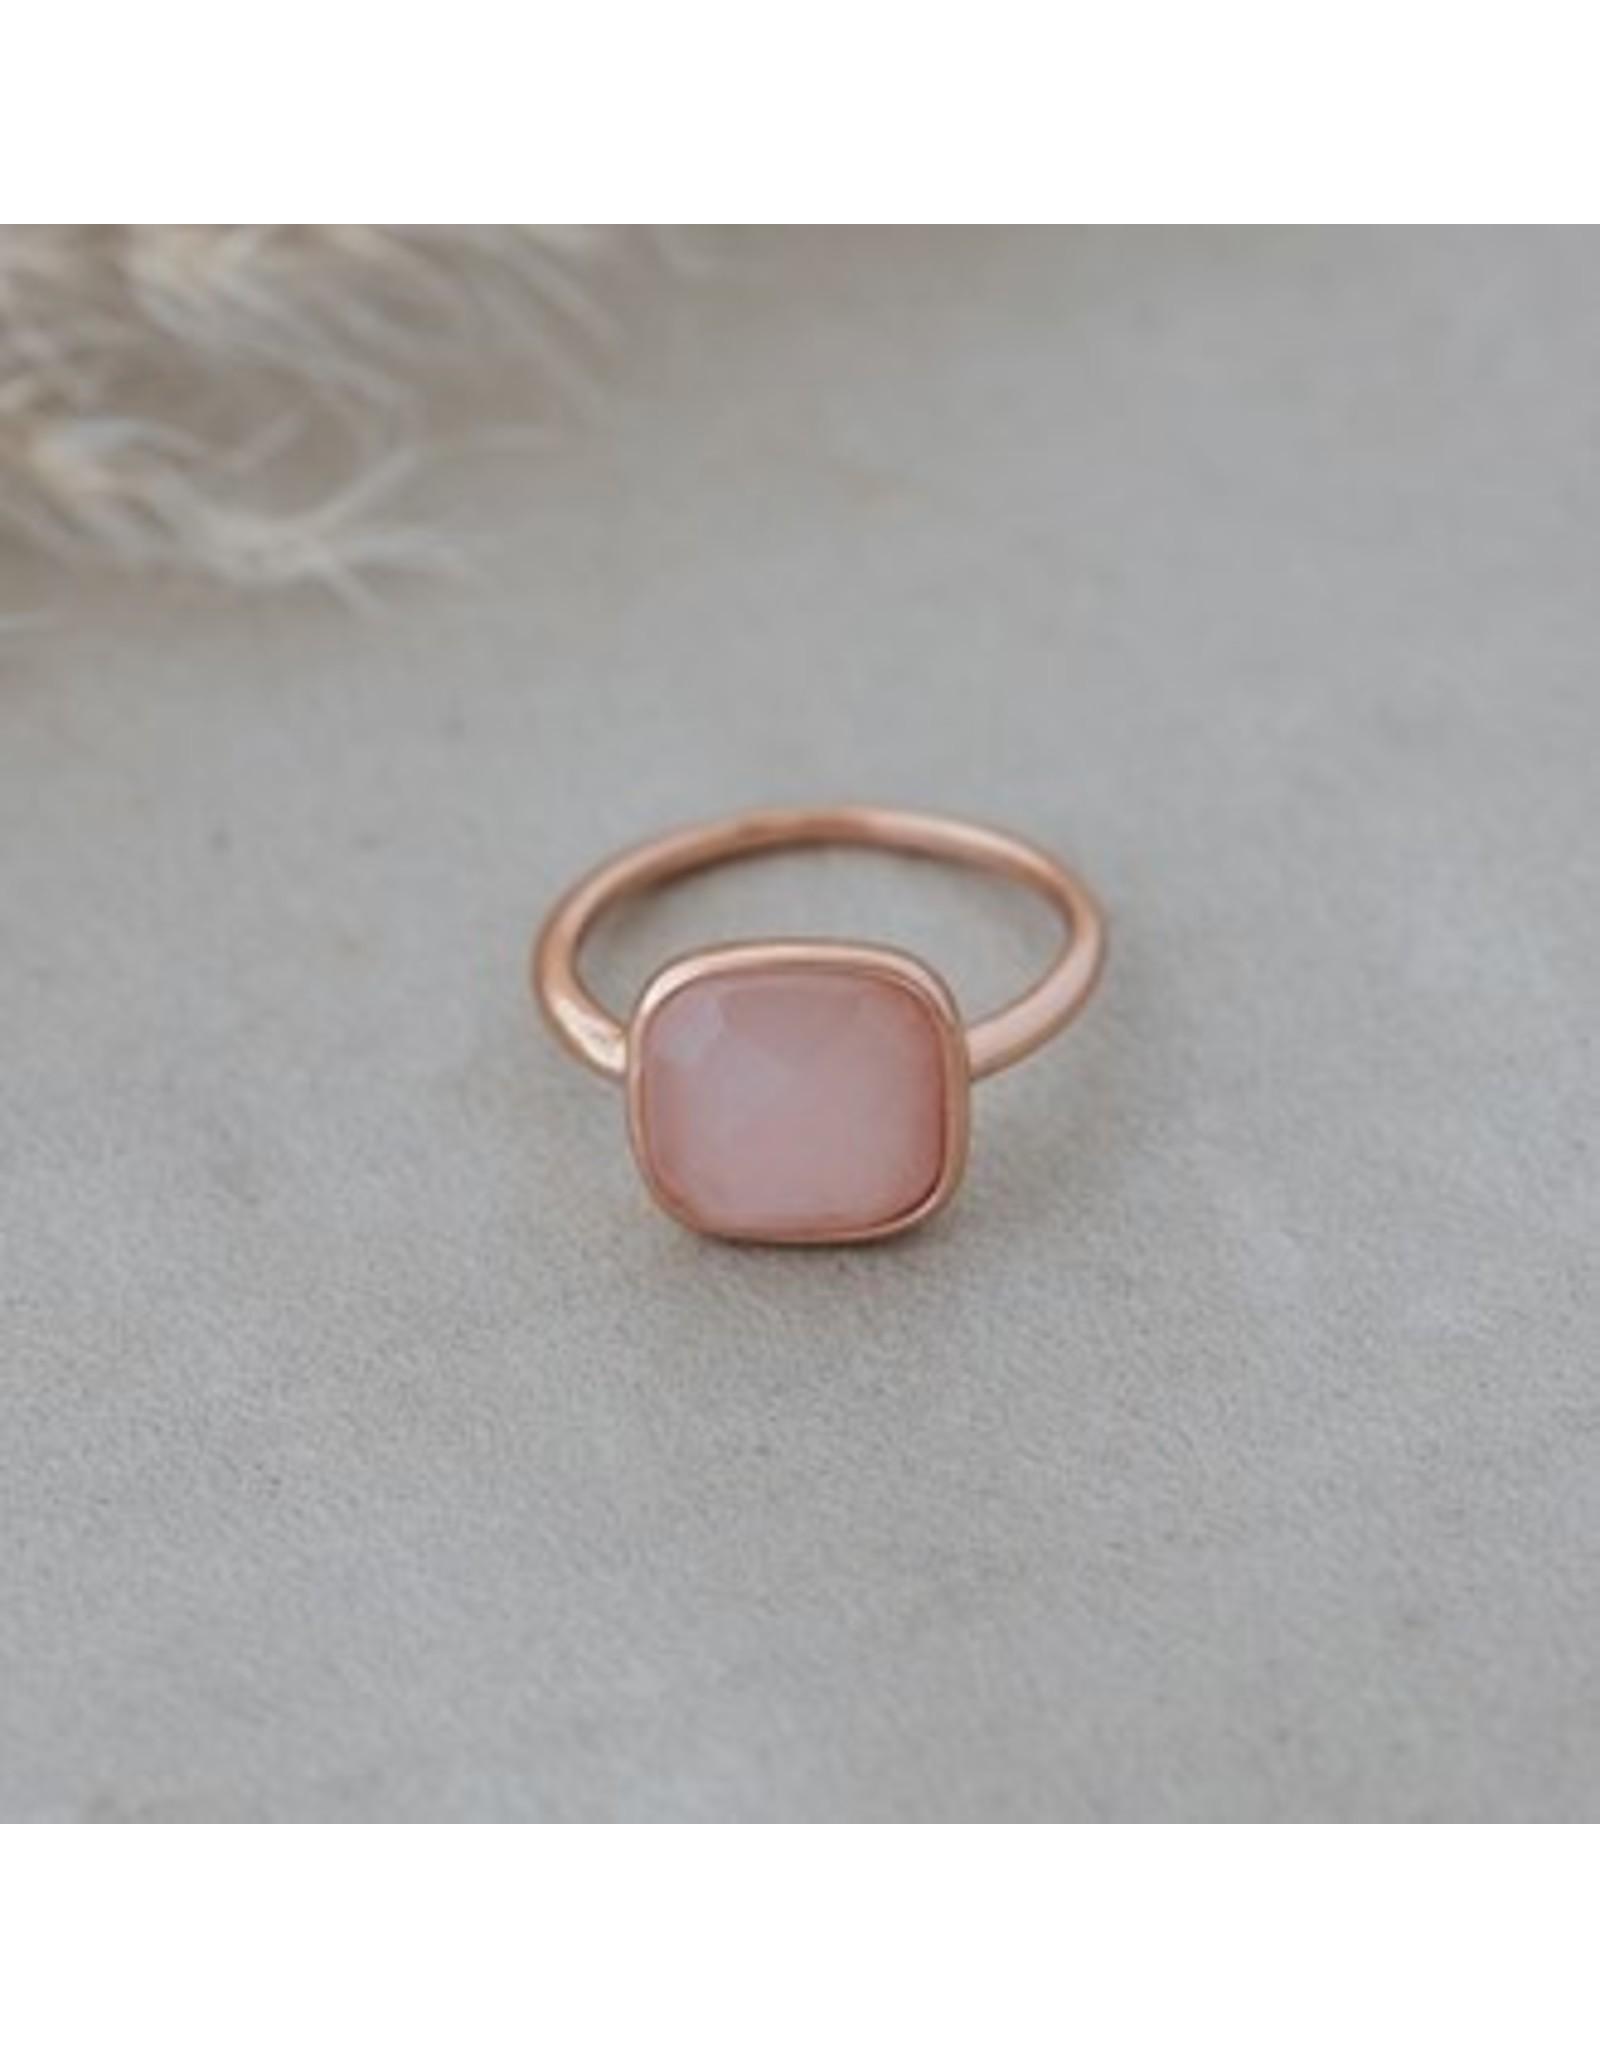 Glee jewelry Ala Mode Ring/Rose Gold